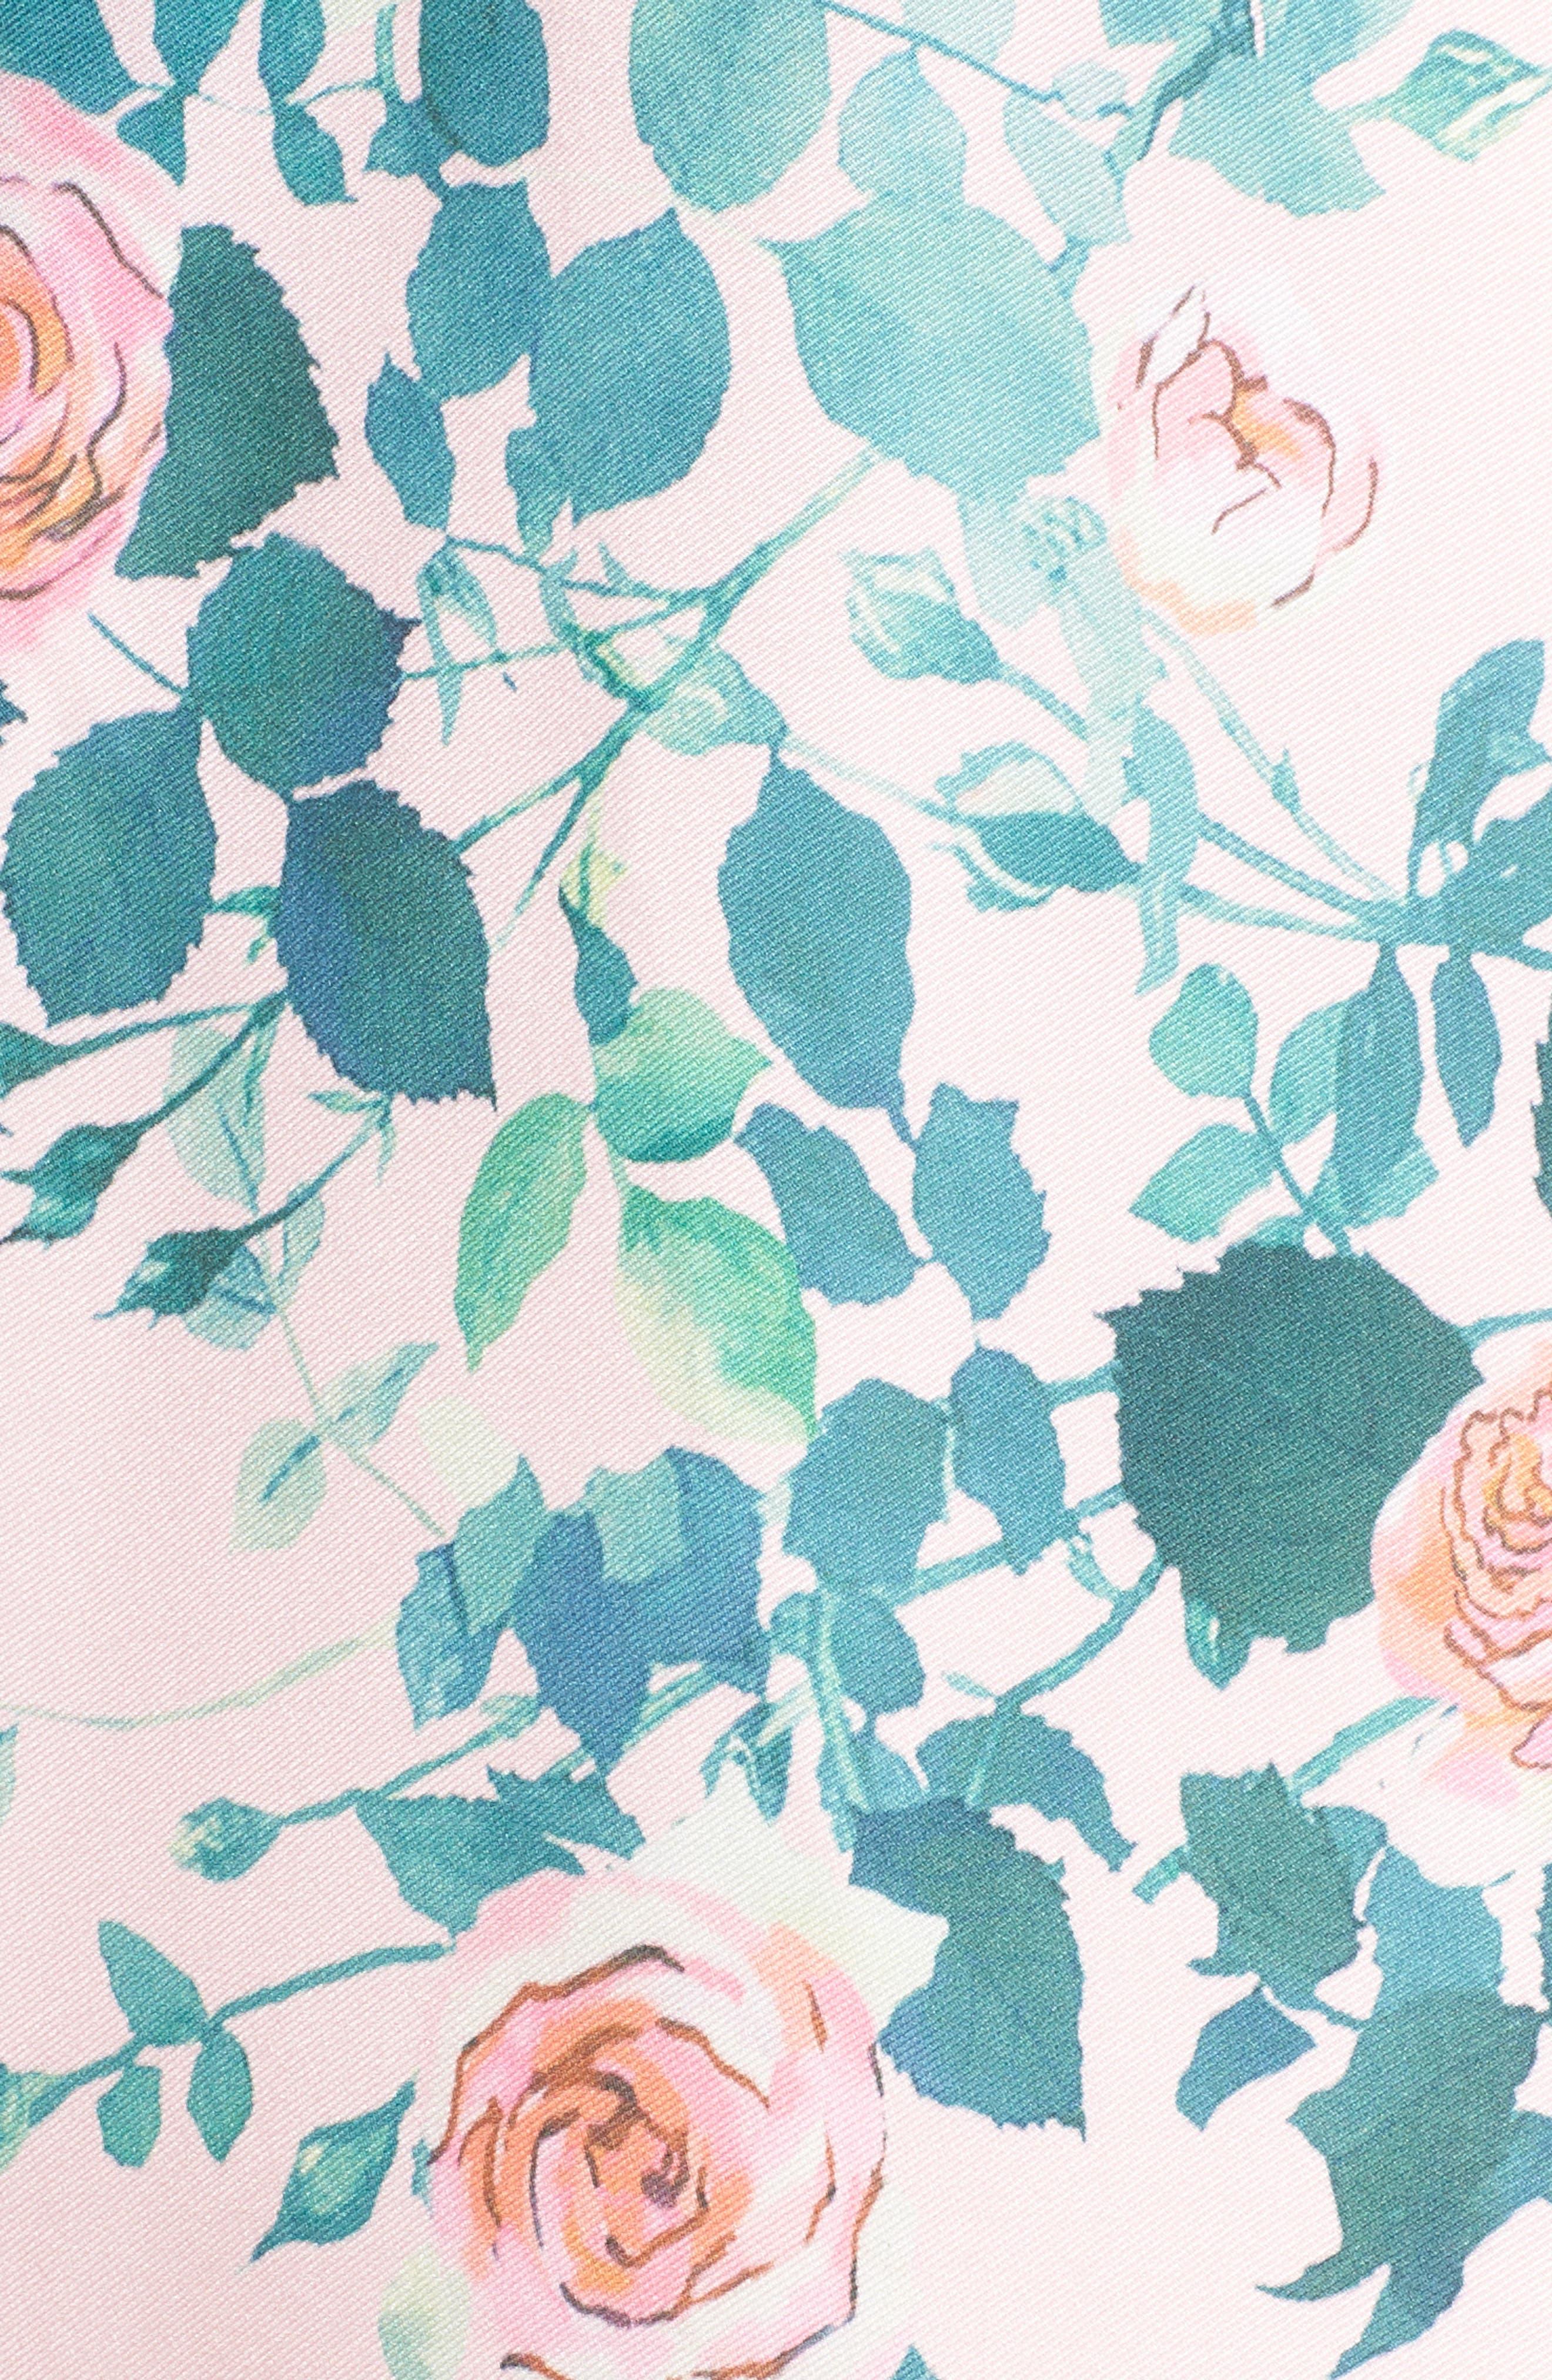 Floral Print Fit & Flare Dress,                             Alternate thumbnail 5, color,                             Pink Rose